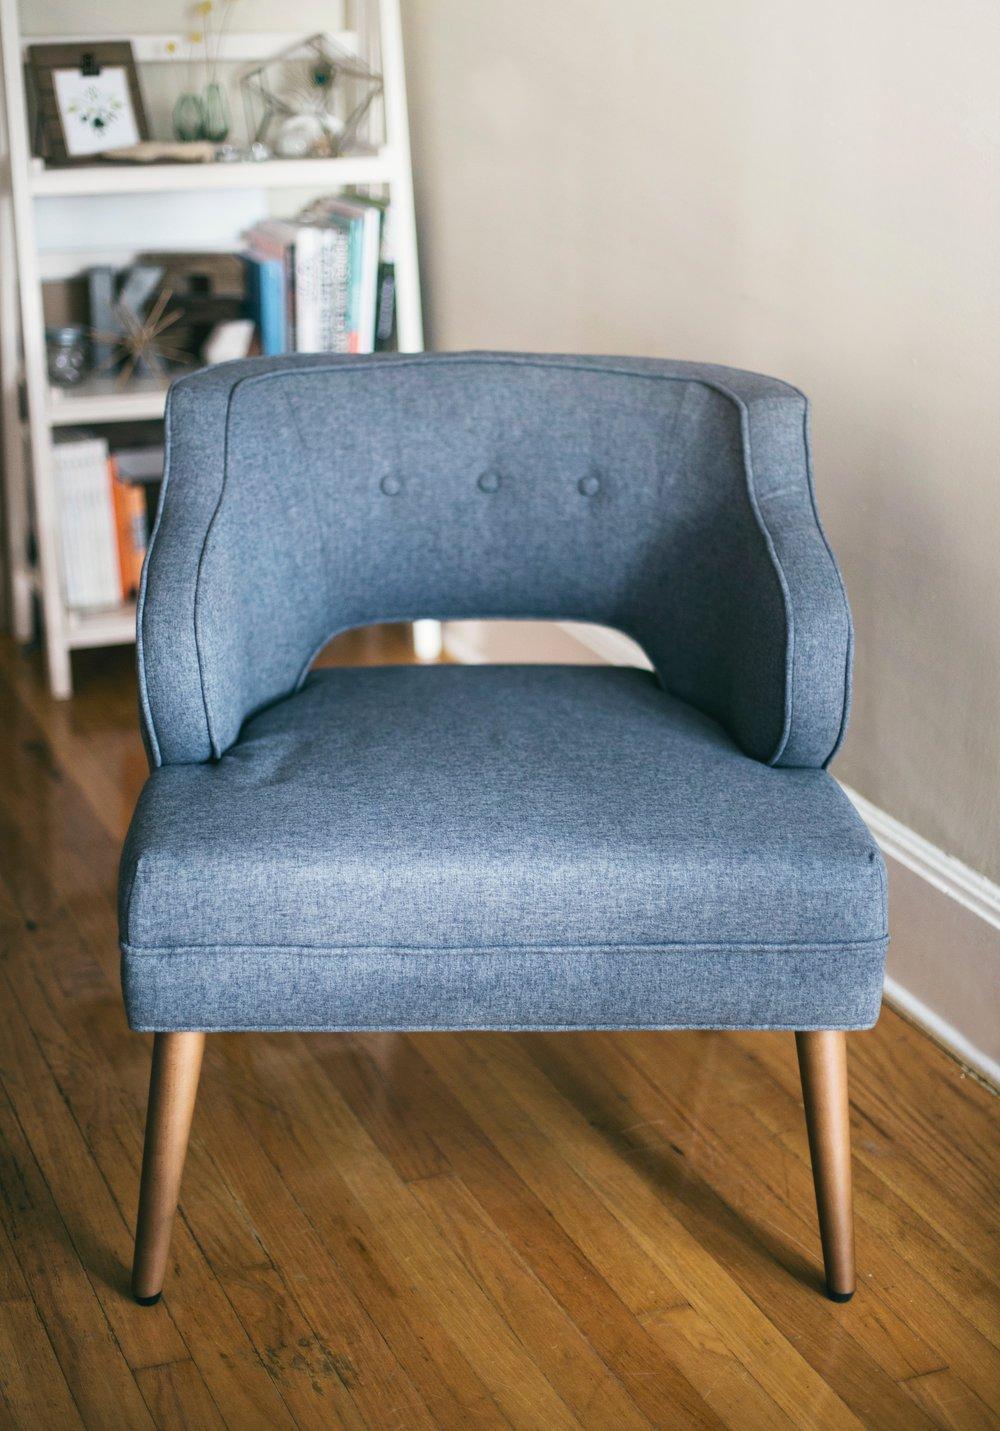 furniture_6.jpg